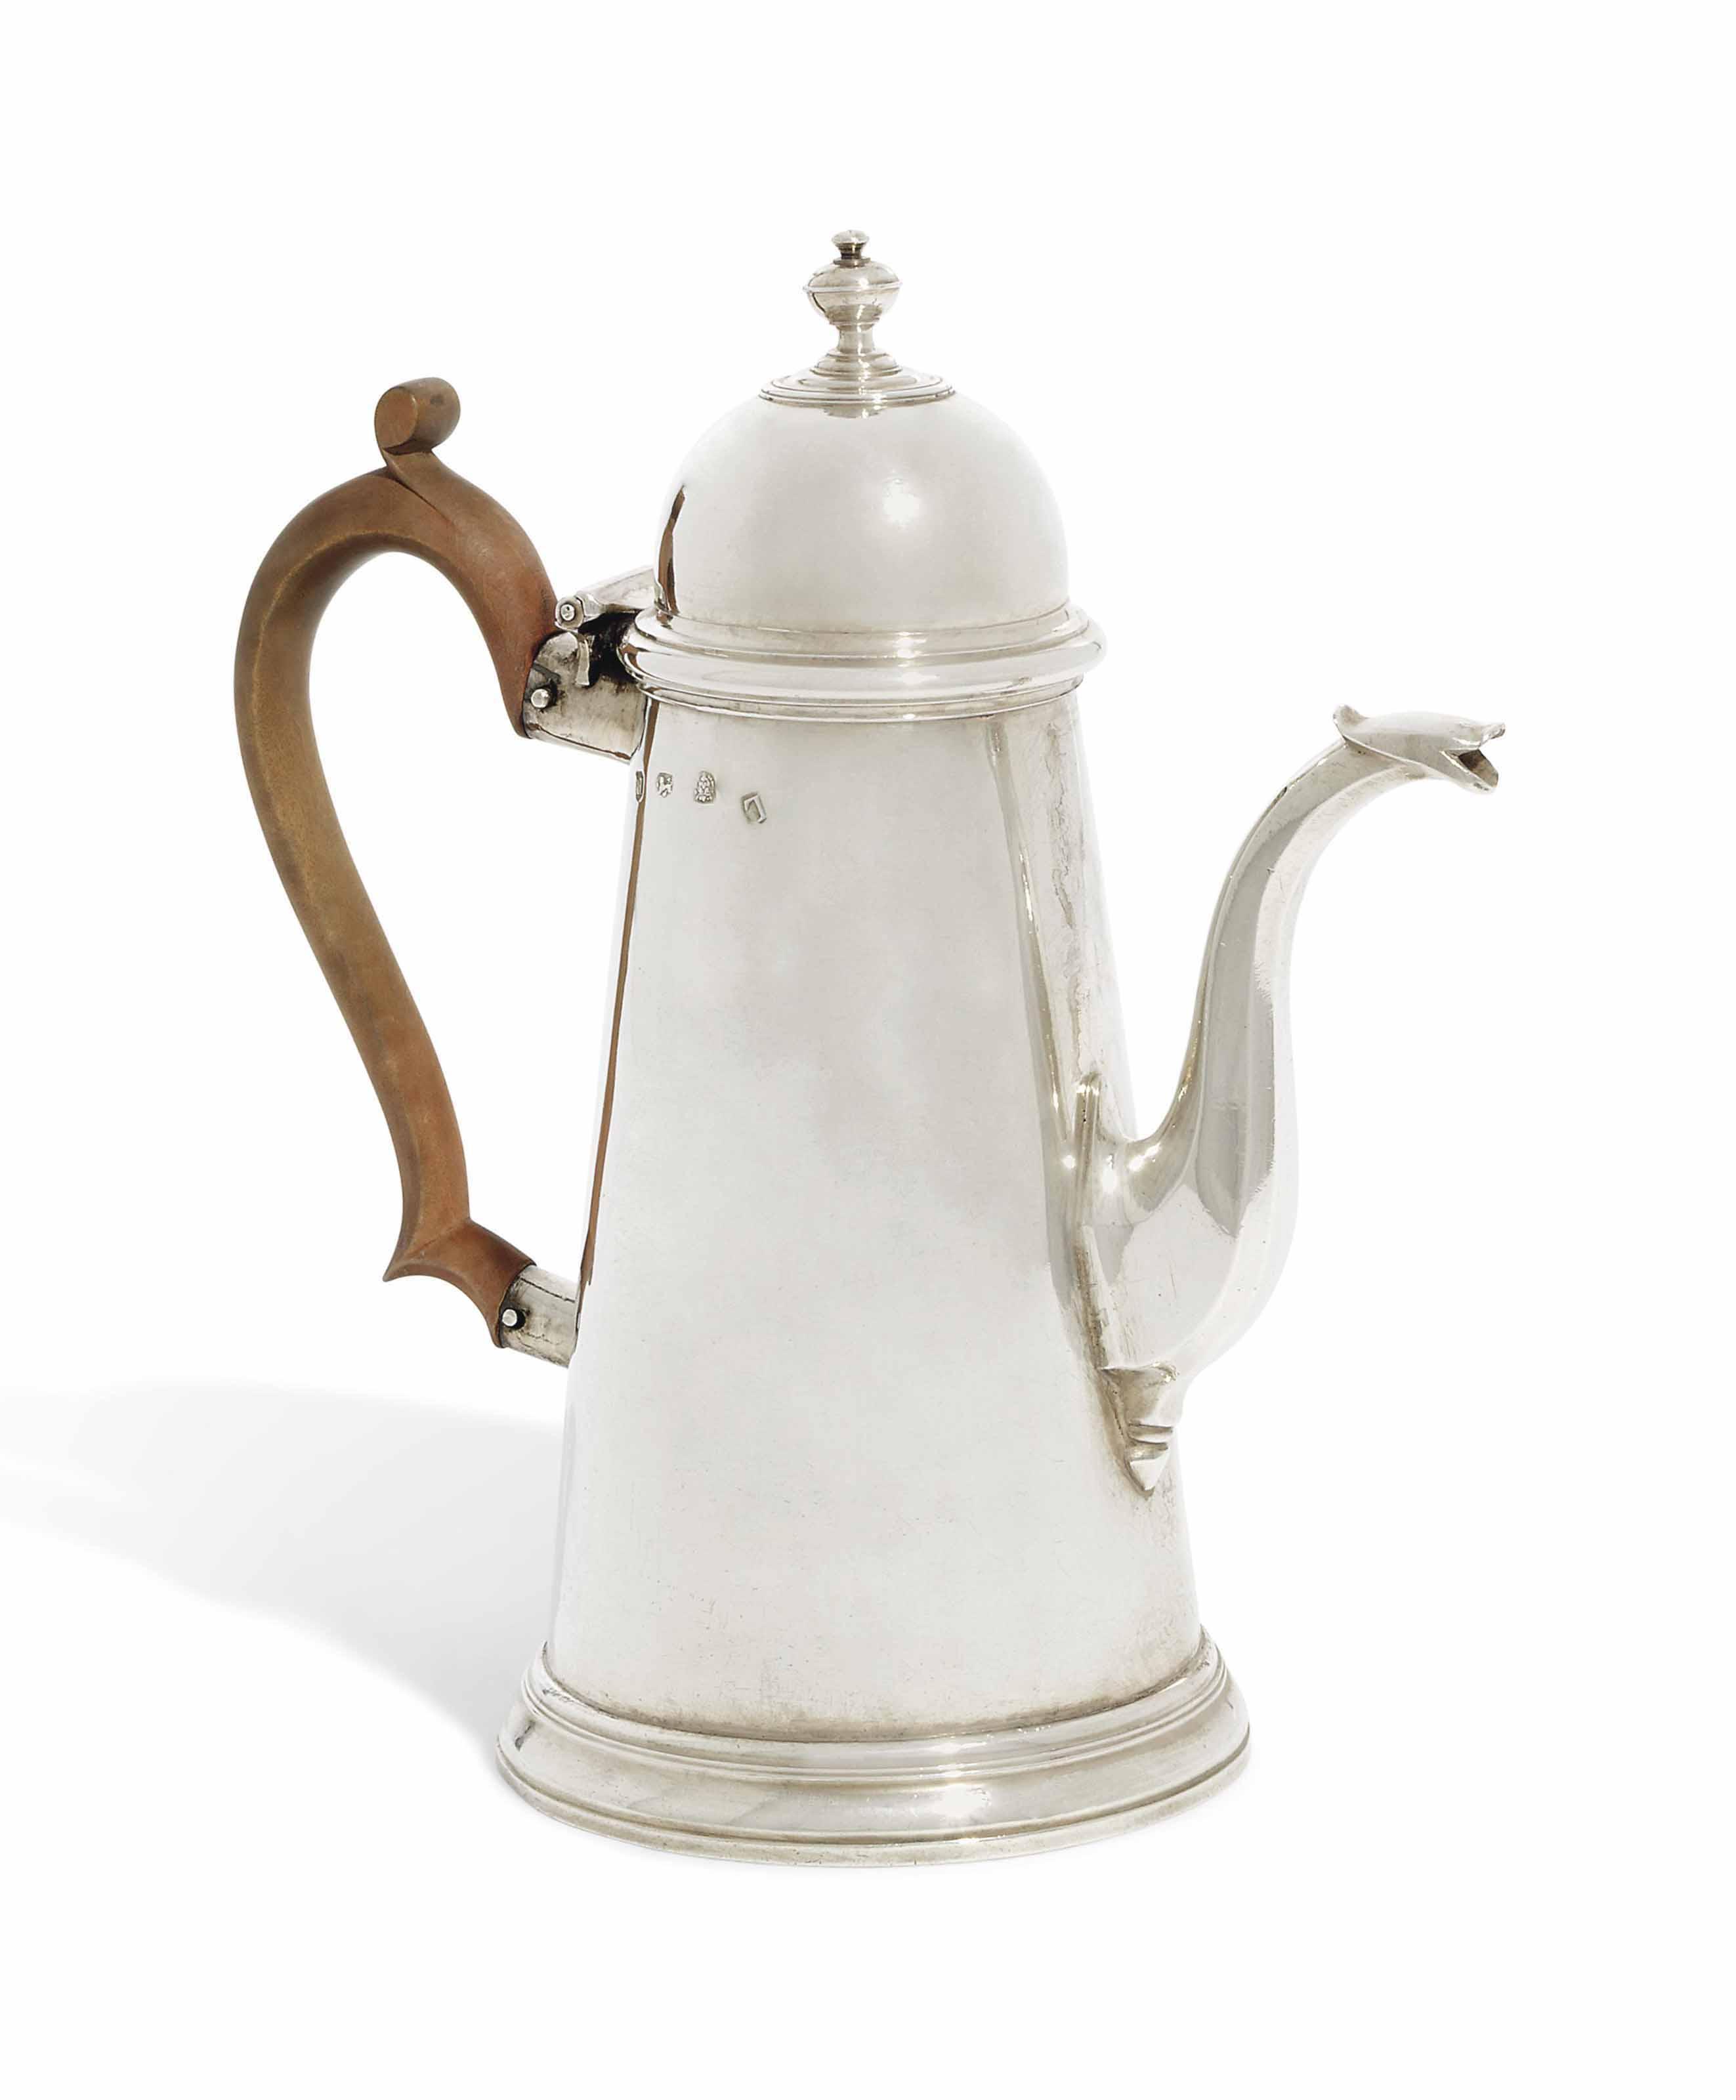 A GEORGE I SILVER COFFEE-POT